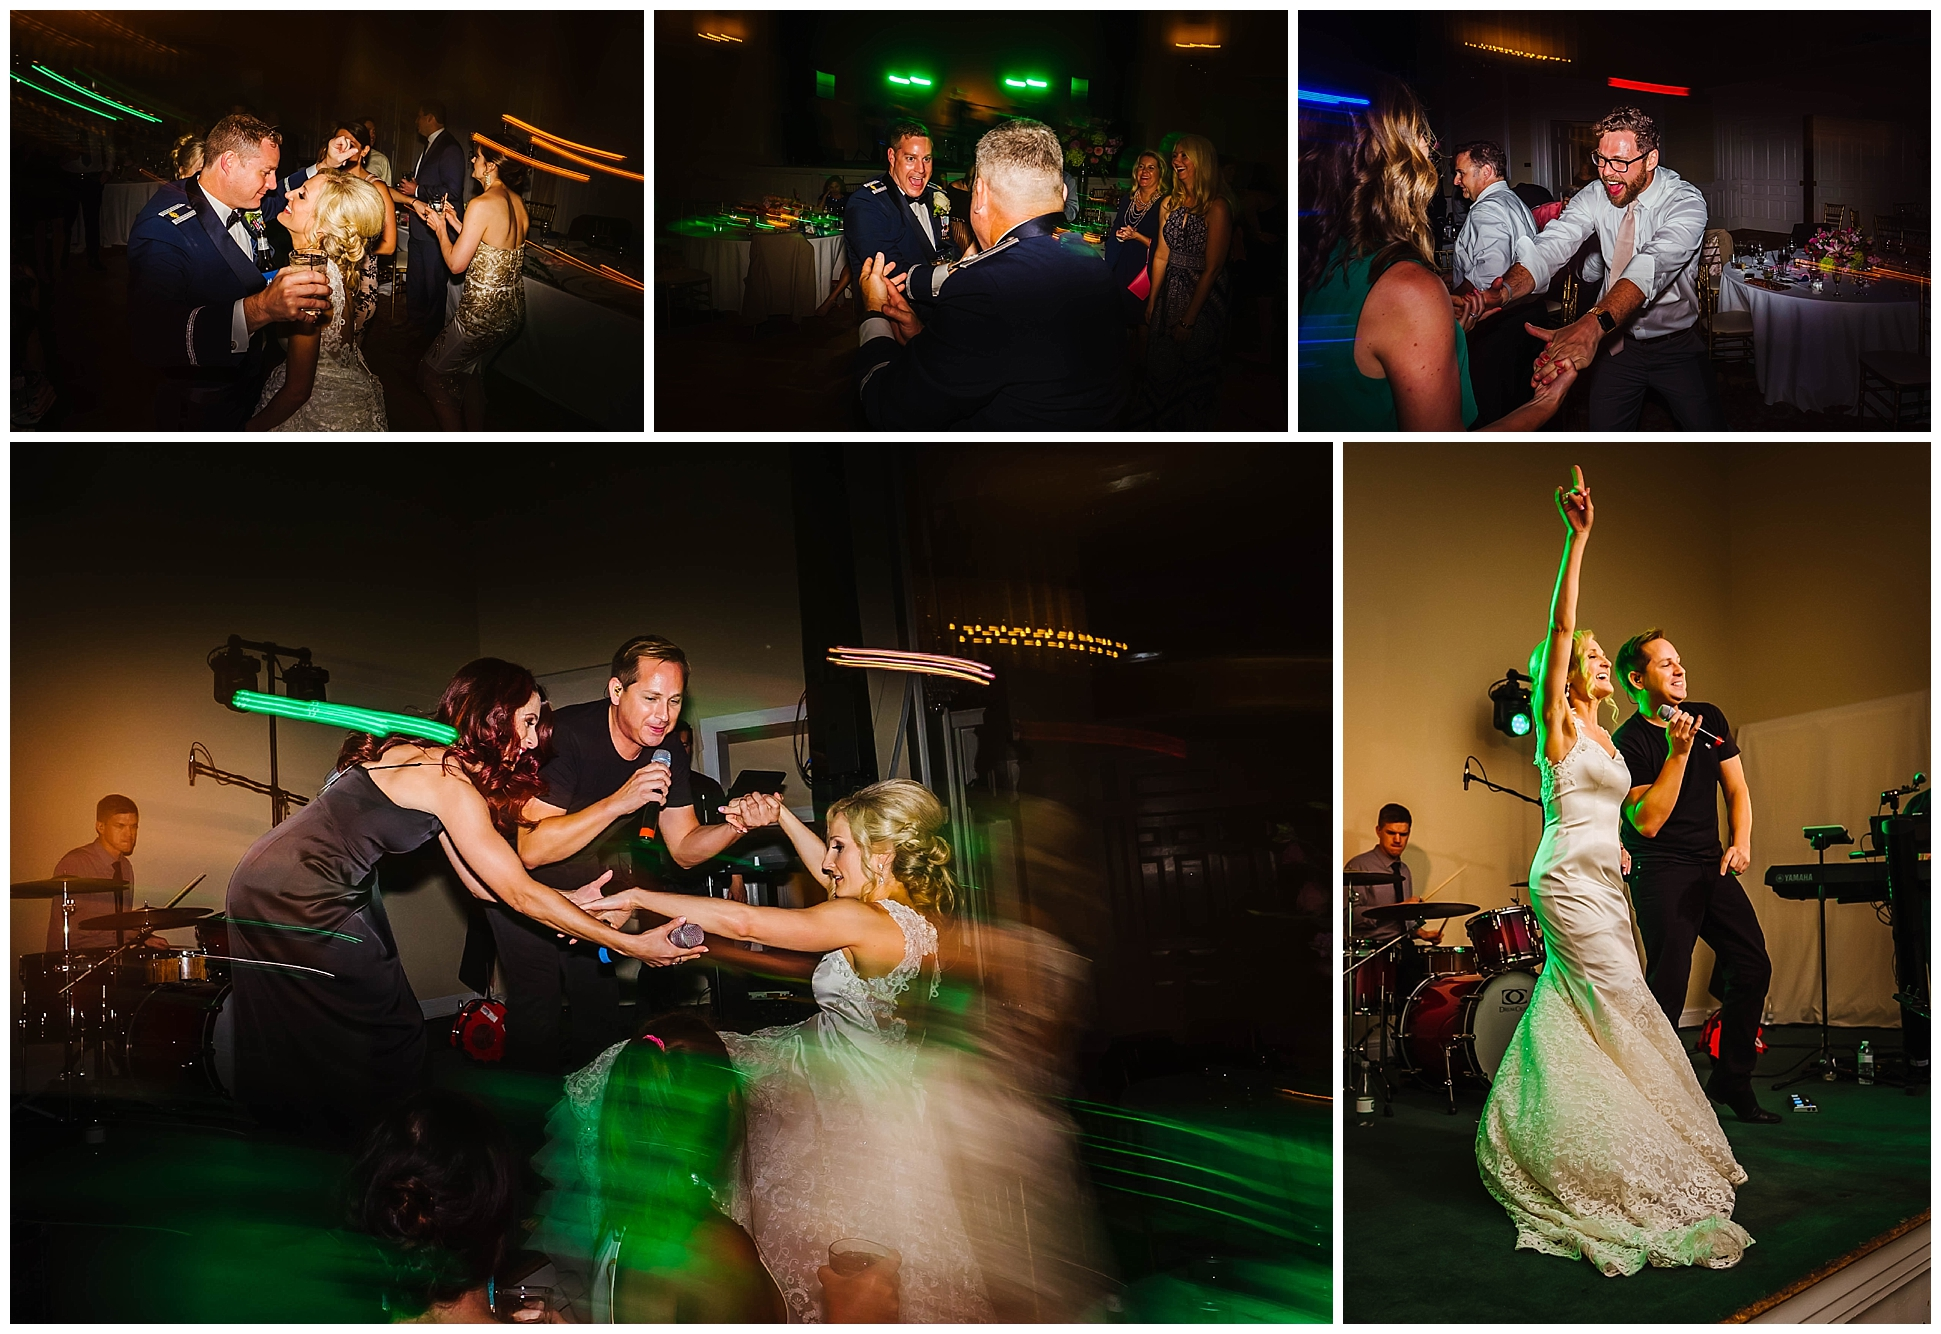 tampa-wedding-photographer-sleeves-palma-ceia-country-club-golf-course-sunset-luxury_0110.jpg